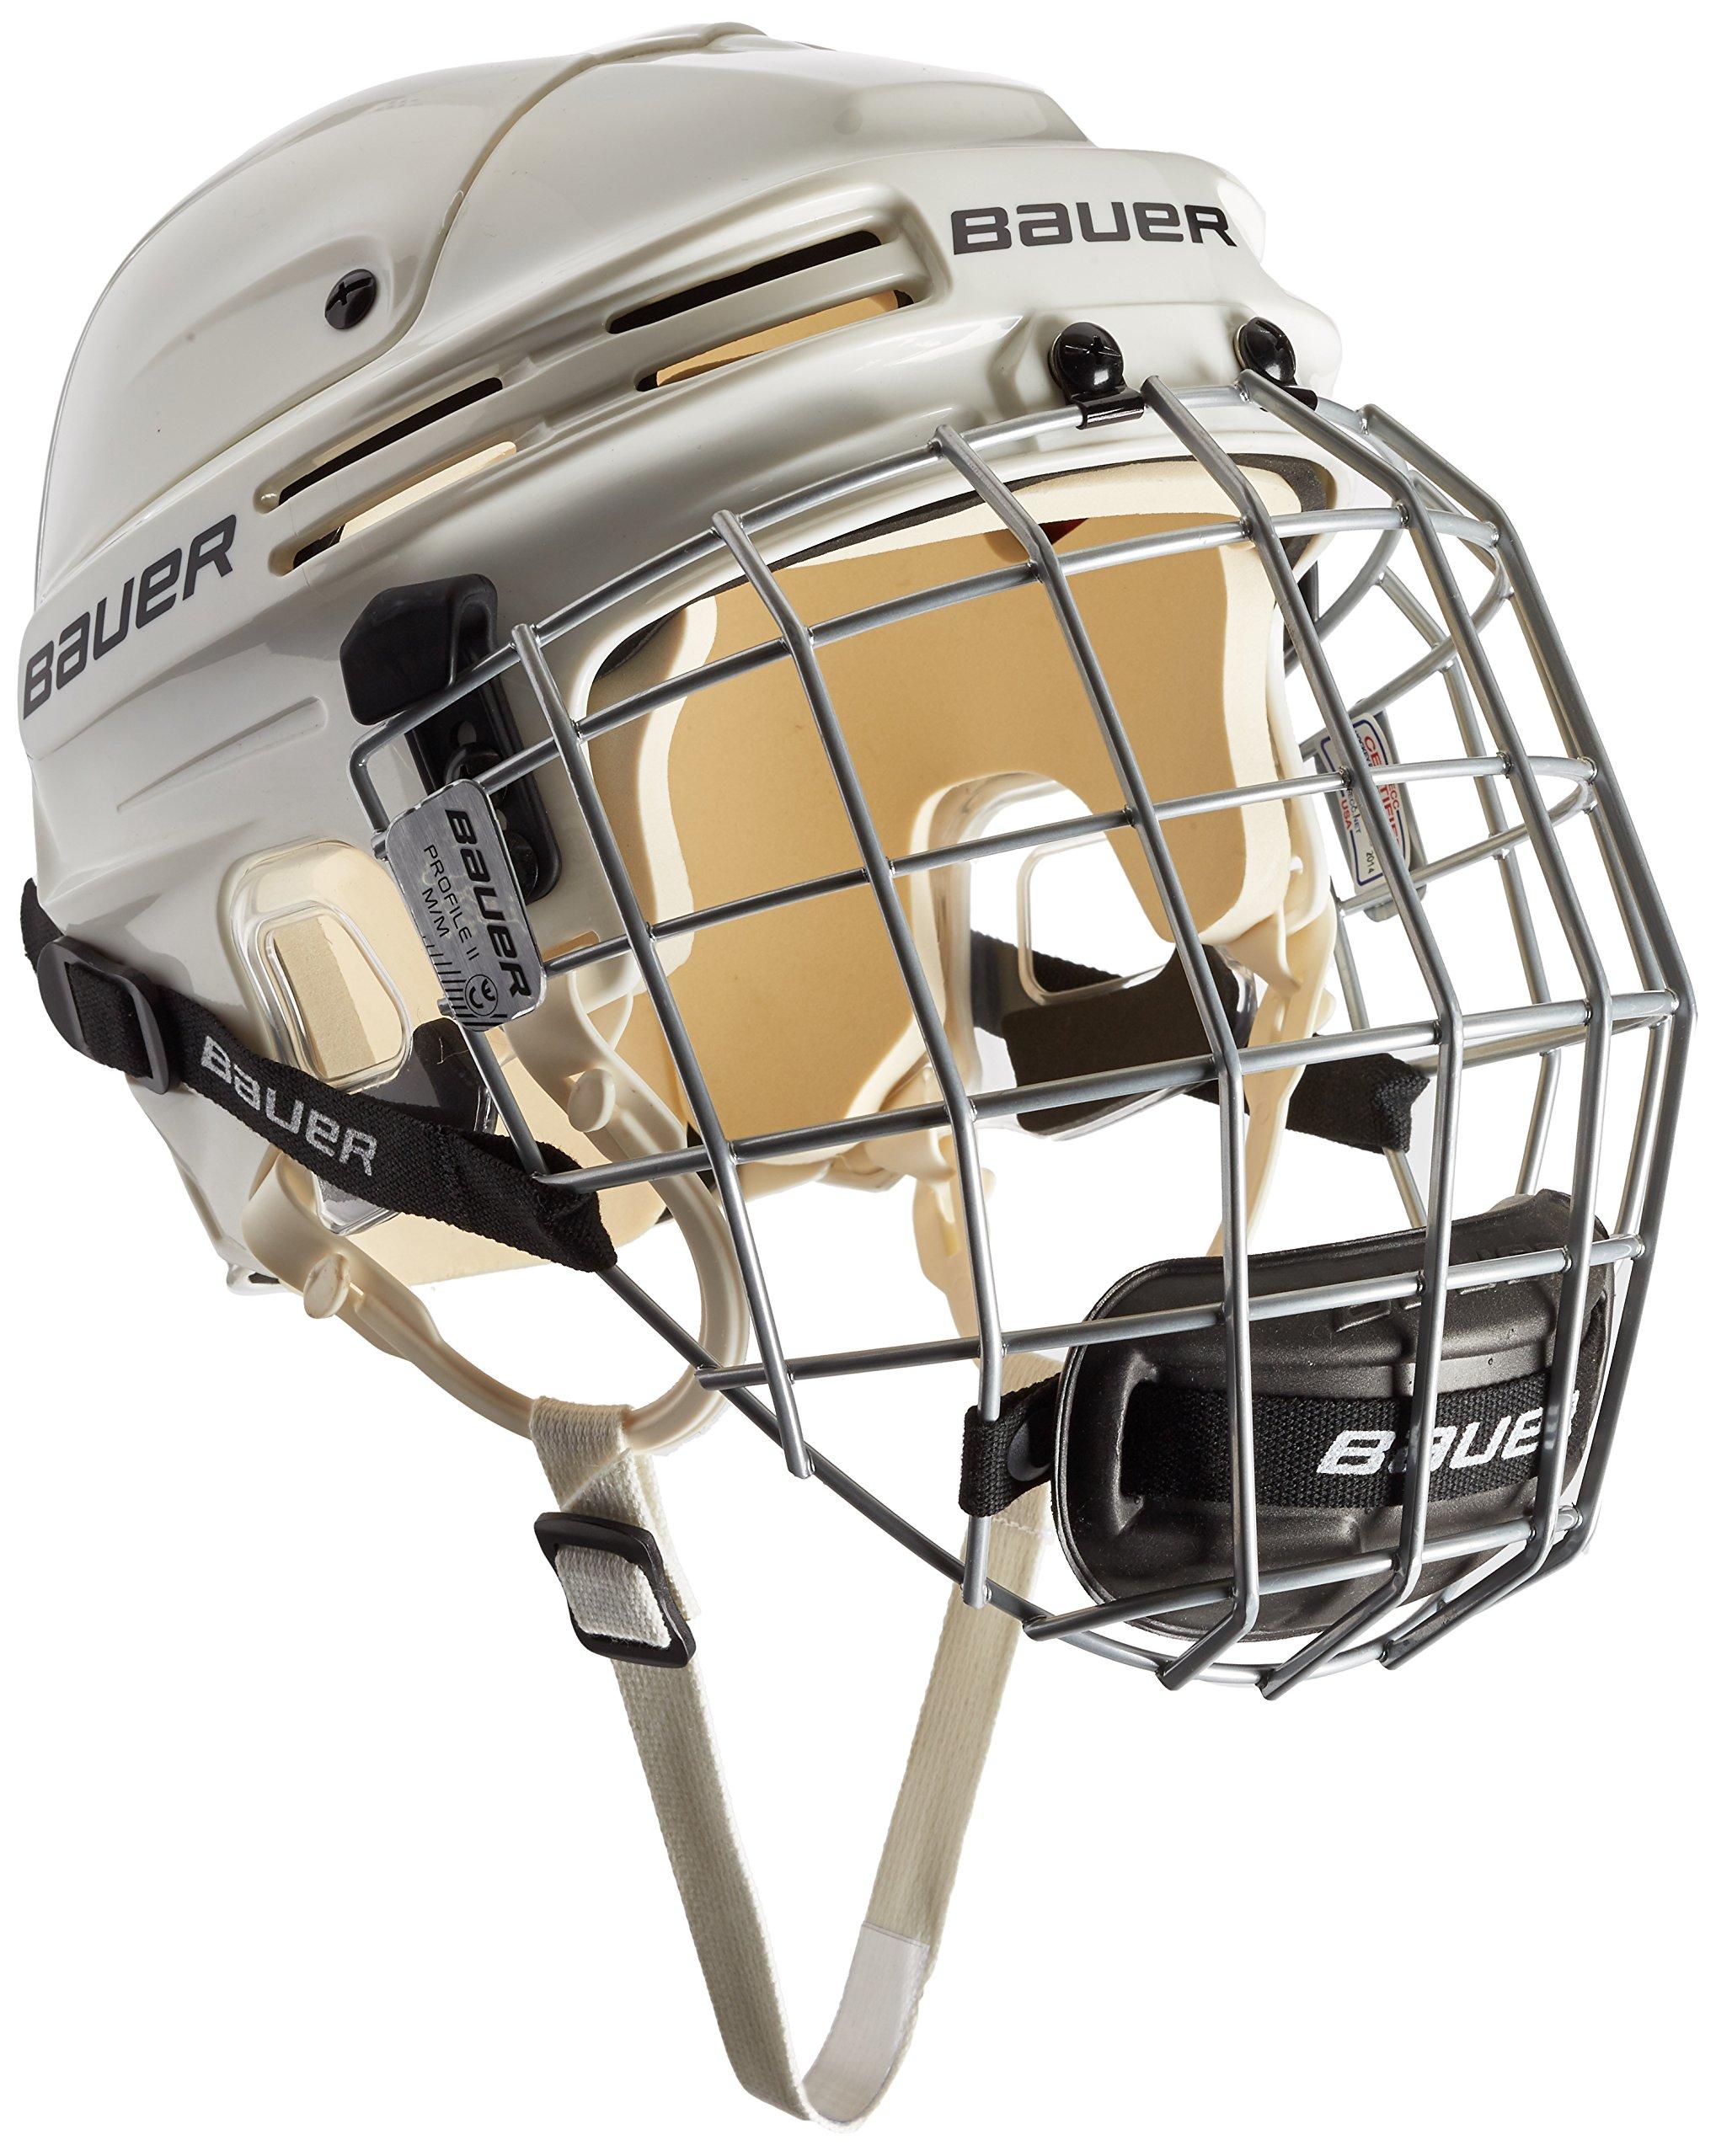 Casco de Hockey Sobre Hielo Color Bauer Eishockeyhelm 4500 Combo mit Gitter